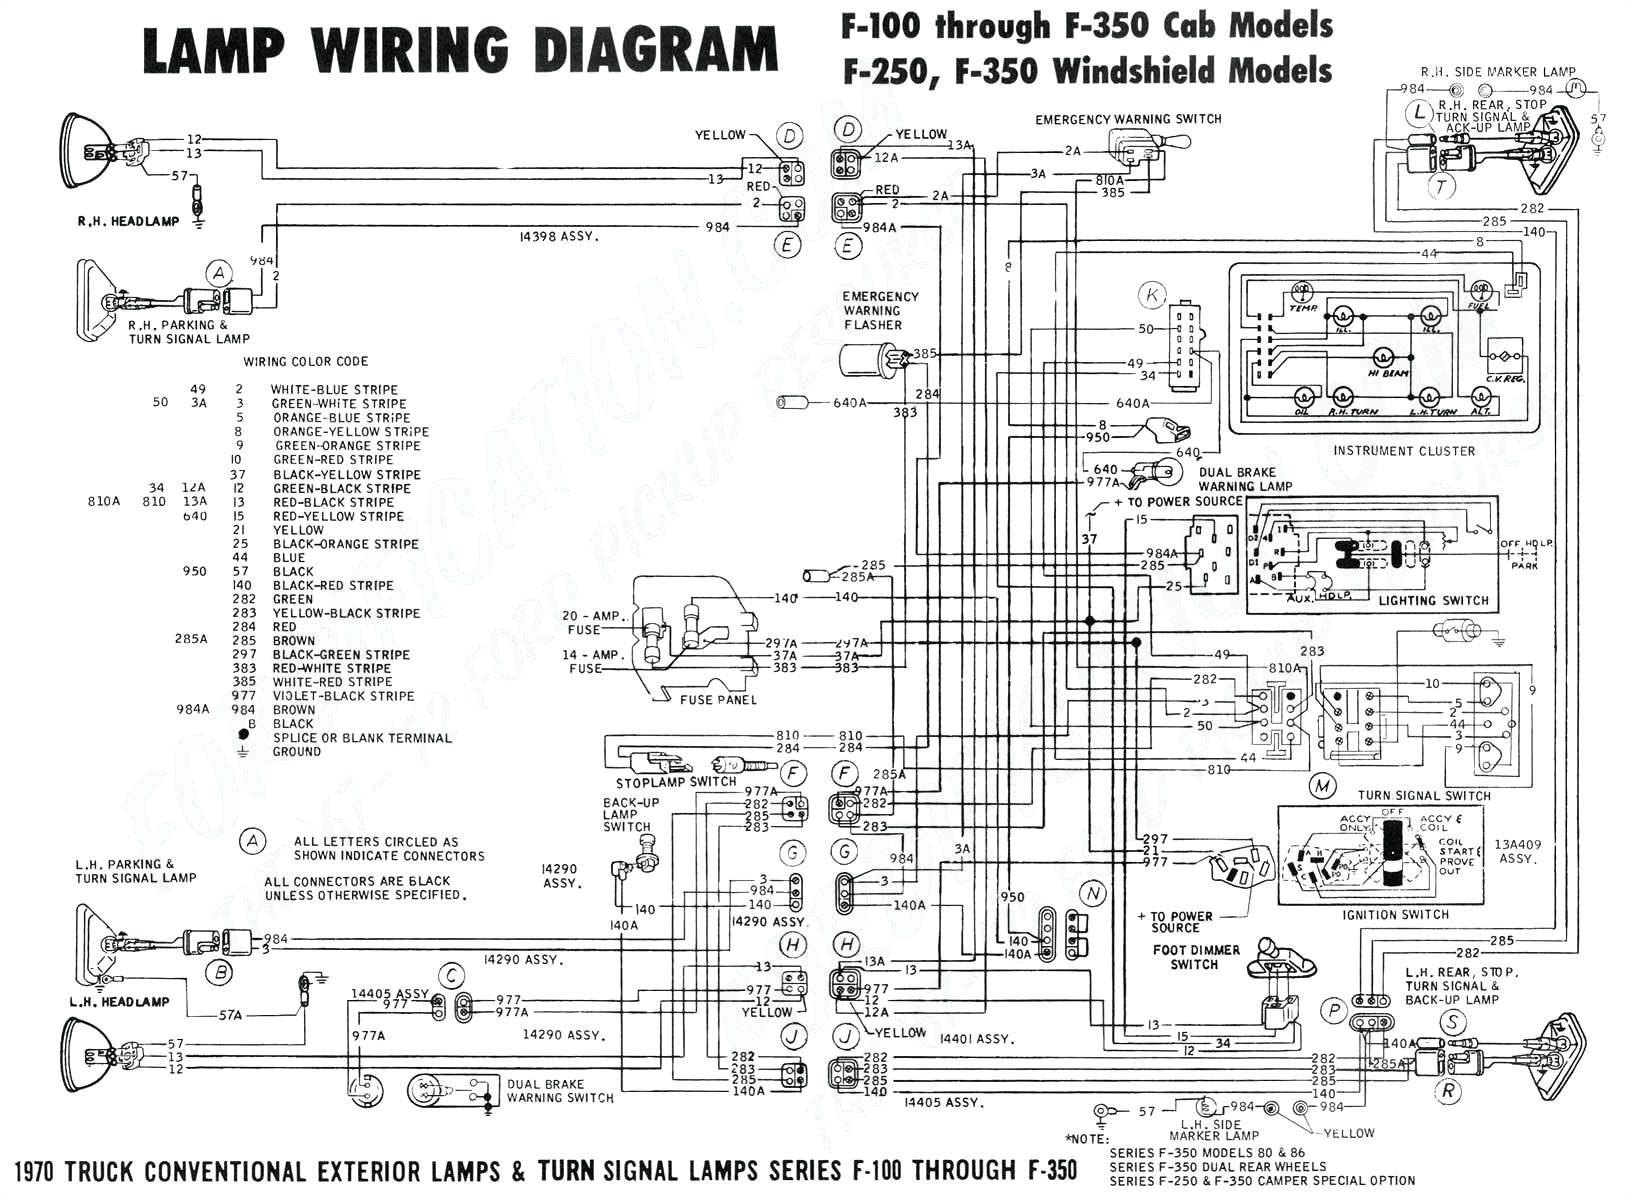 2001 Dodge Ram Ignition Switch Wiring Diagram Dodge Ram Ignition Diagram Wiring Diagram Paper